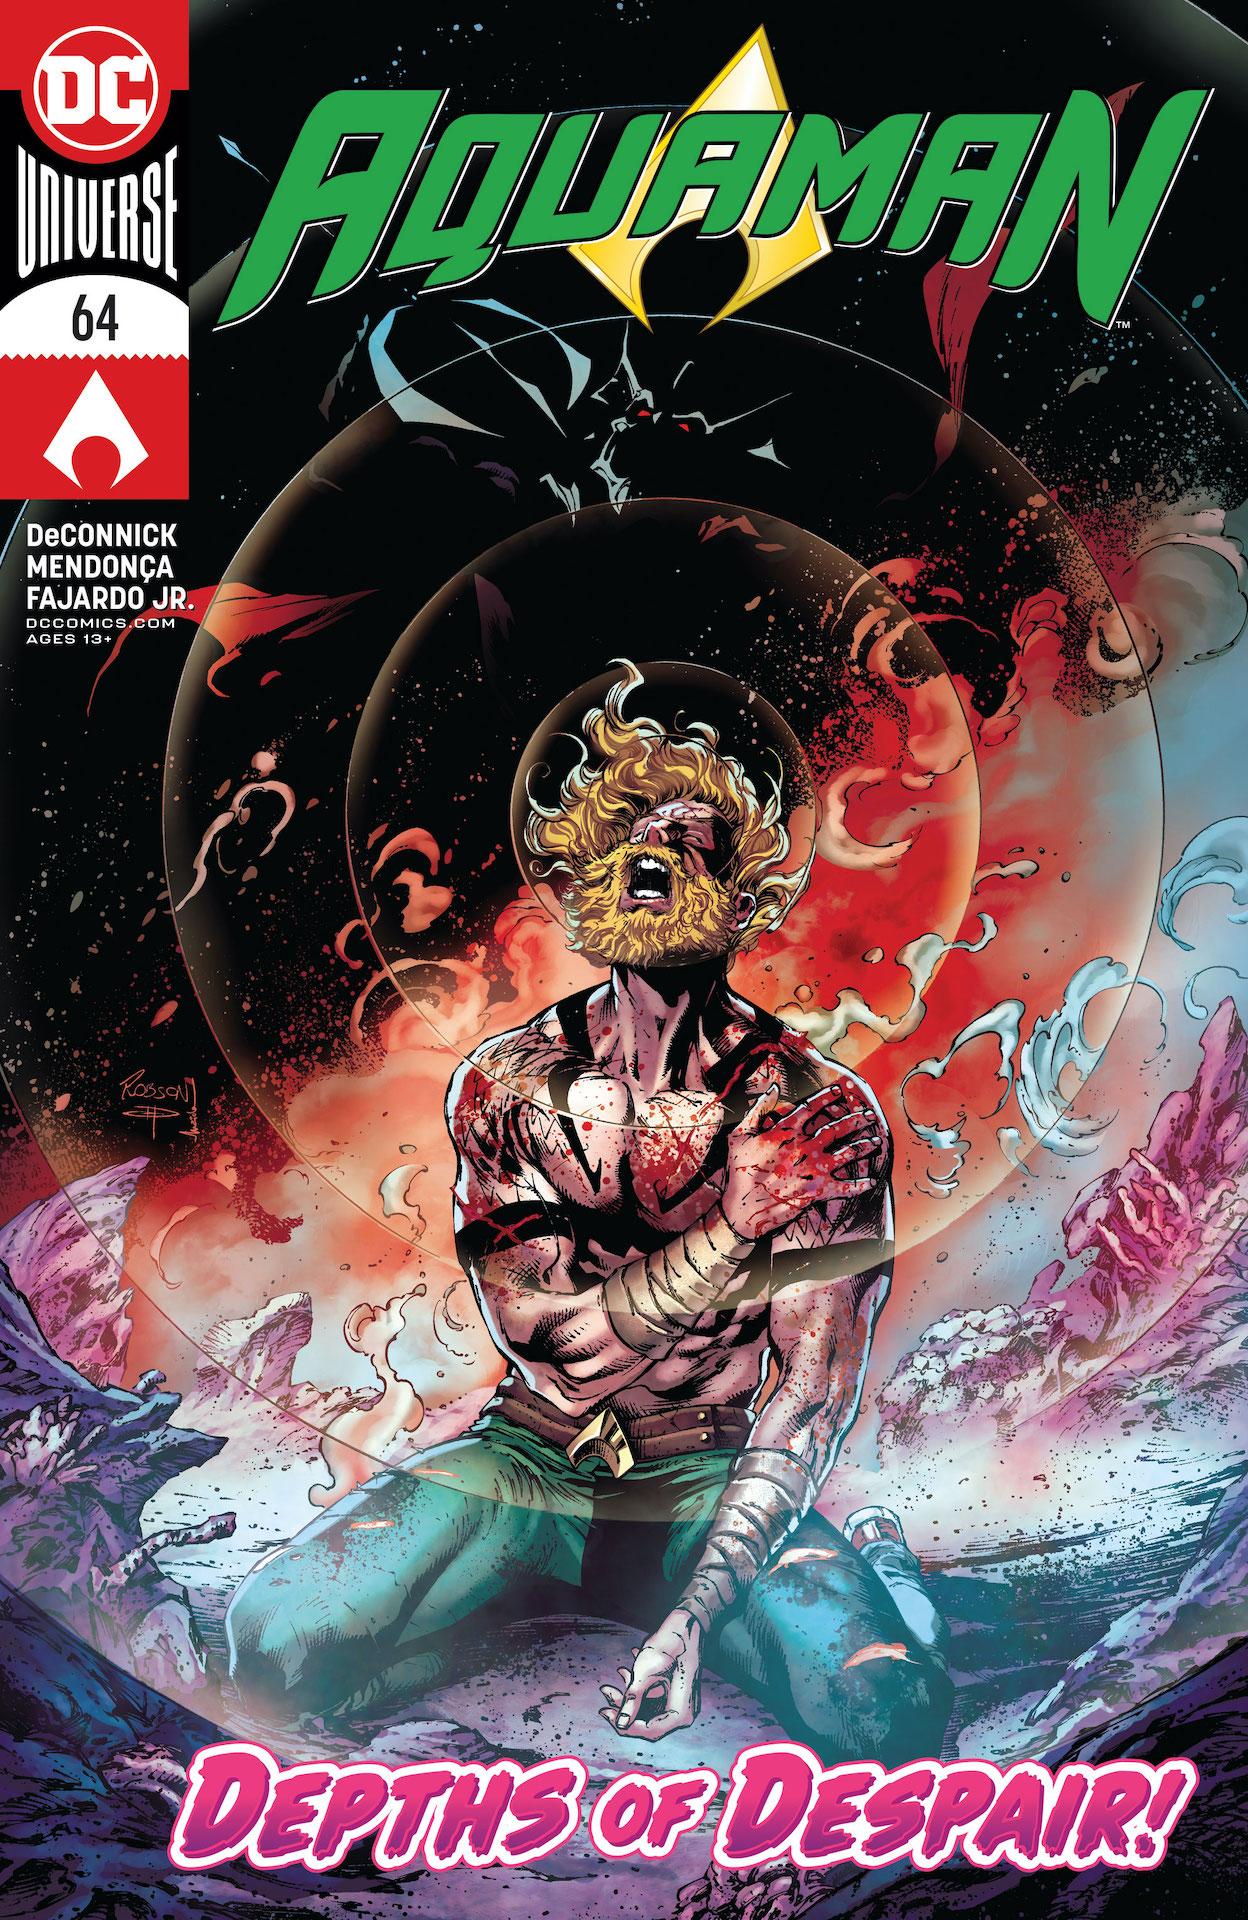 Aquaman #64 preview